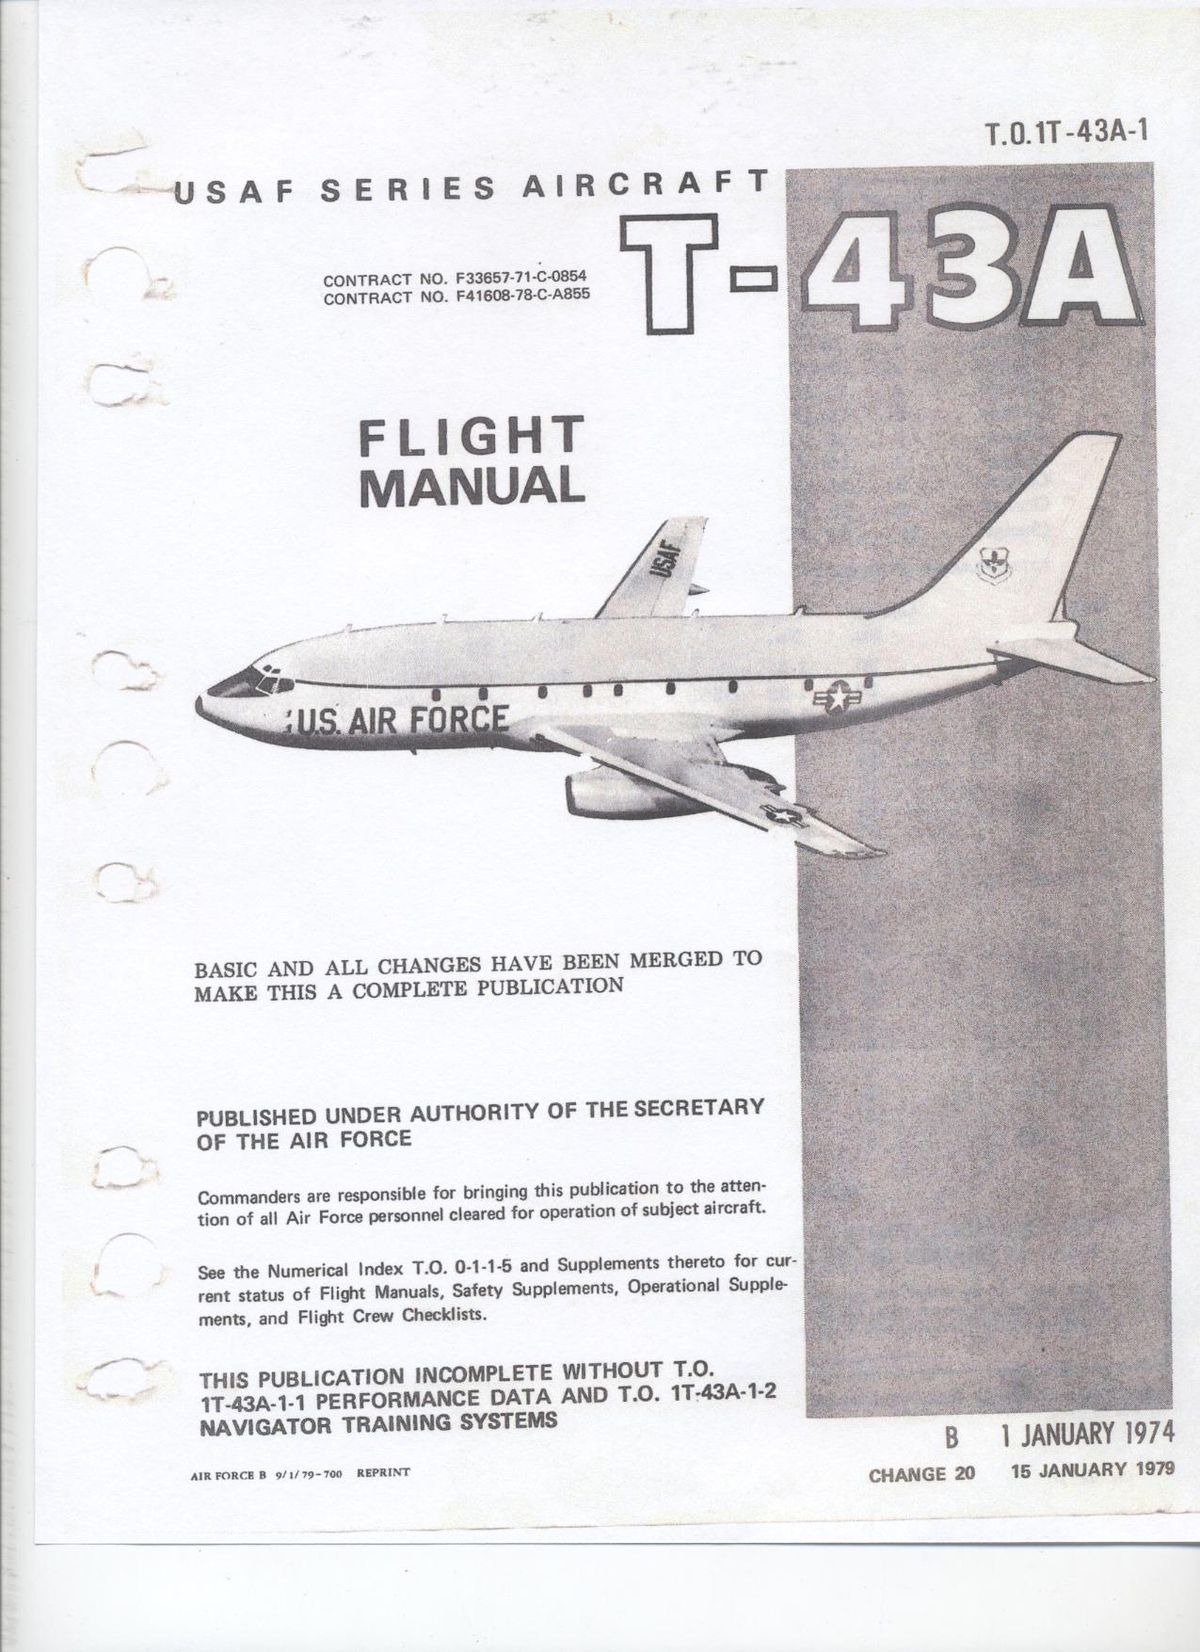 Aircraft flight manual - Wikipedia